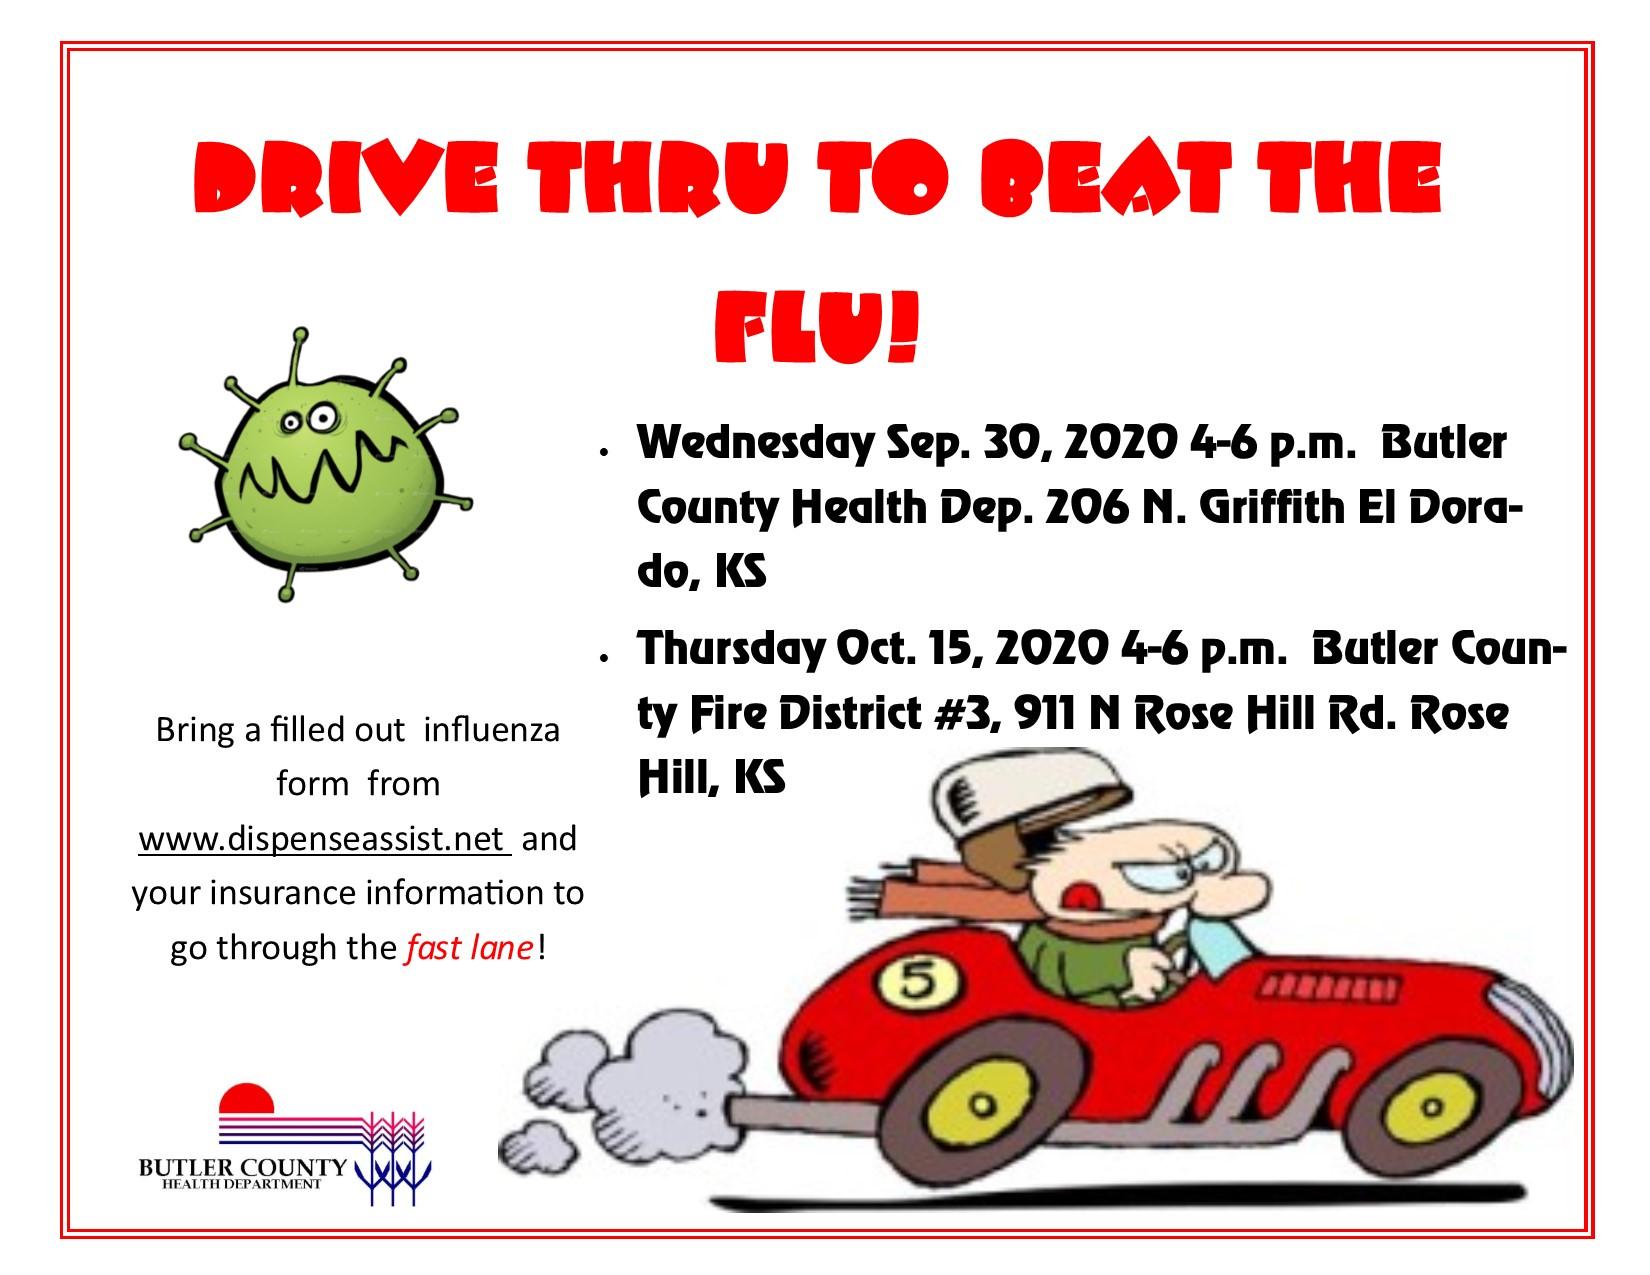 Drive thru to beat the flu